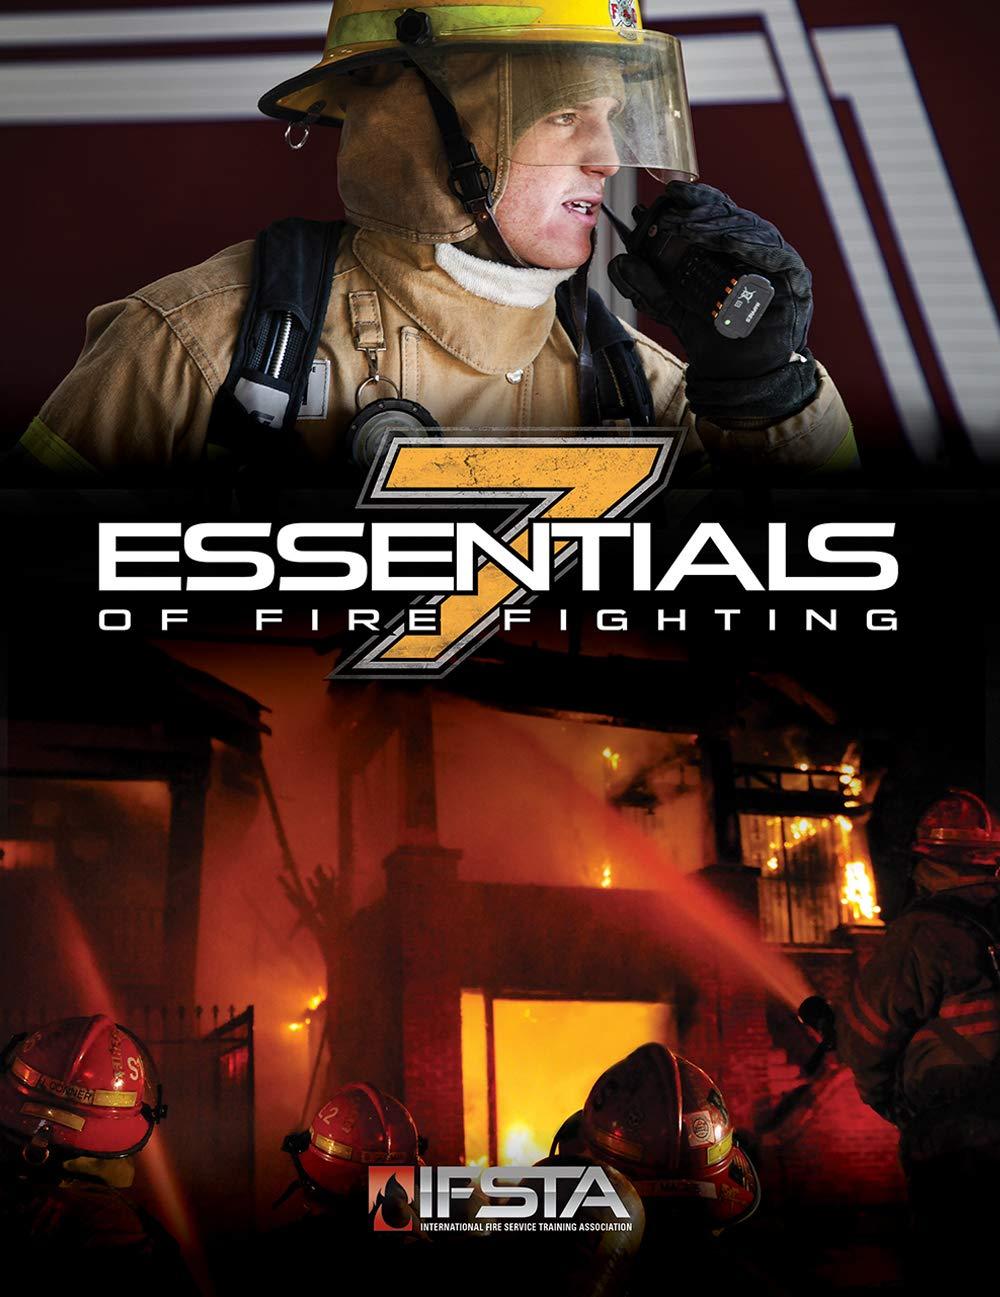 Essentials of FireFighting 7th edition: International Fire